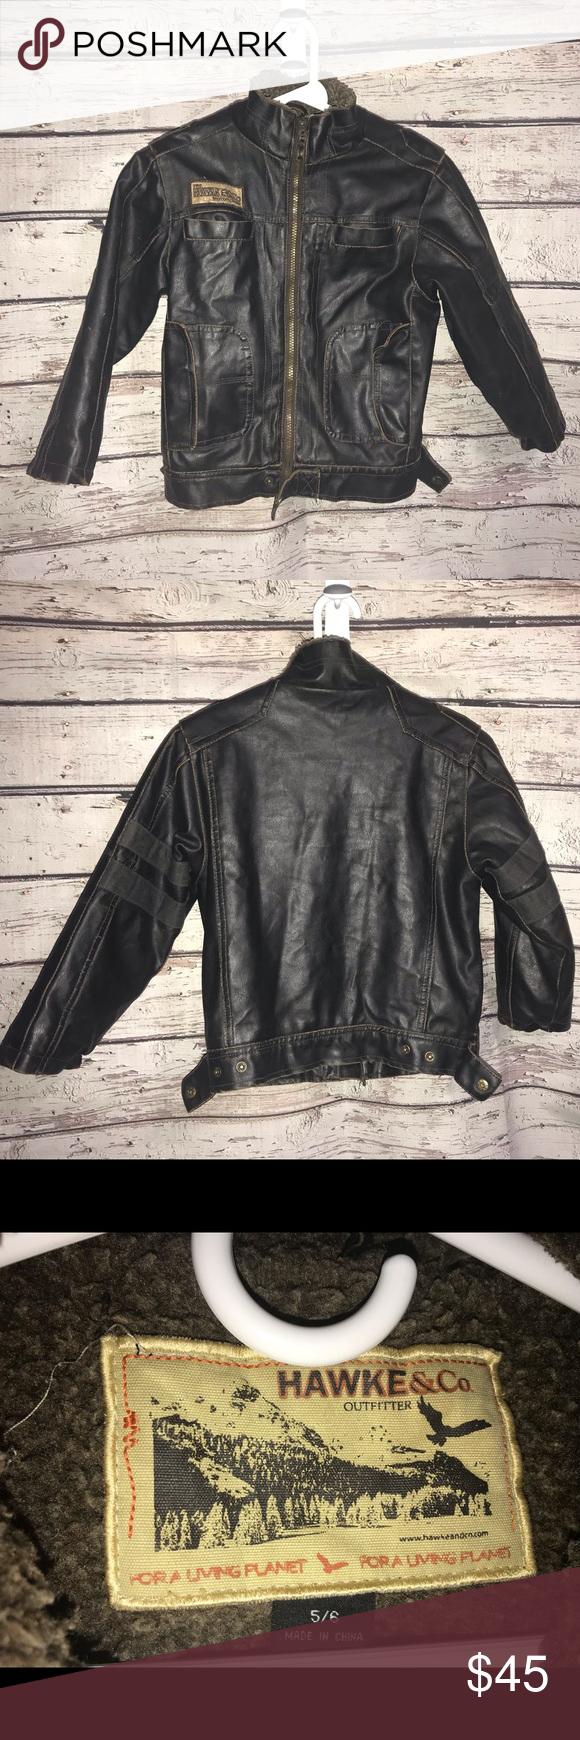 Hawke And Co Jacket Jackets Leather Jacket Faux Leather Jackets [ 1740 x 580 Pixel ]